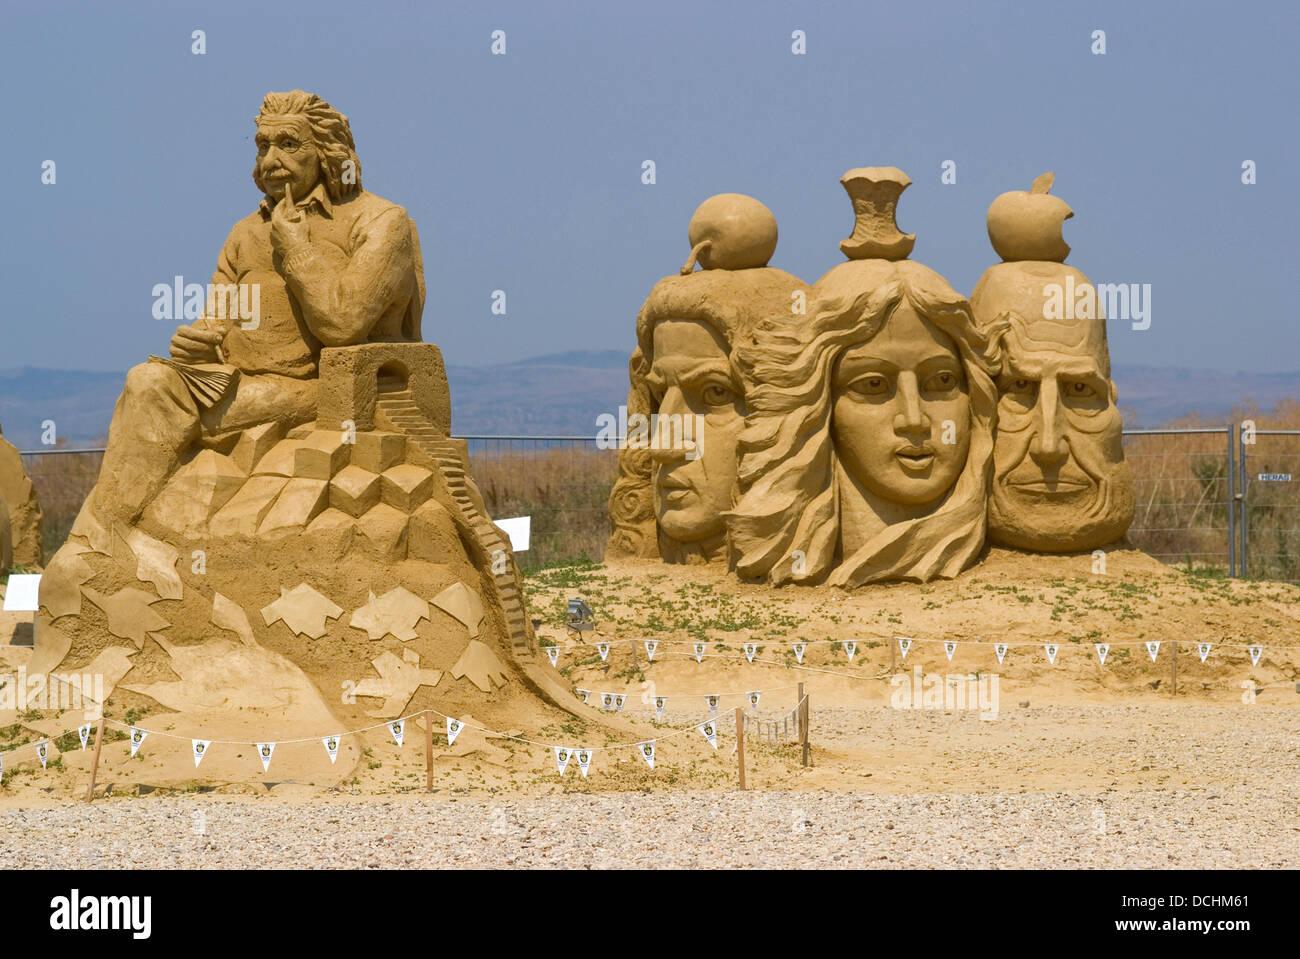 Burgas, Bulgaria. 19th Aug, 2013. Sculpture artists from England, Indonesia, Belgium, Holland, Russia, Ireland, - Stock Image